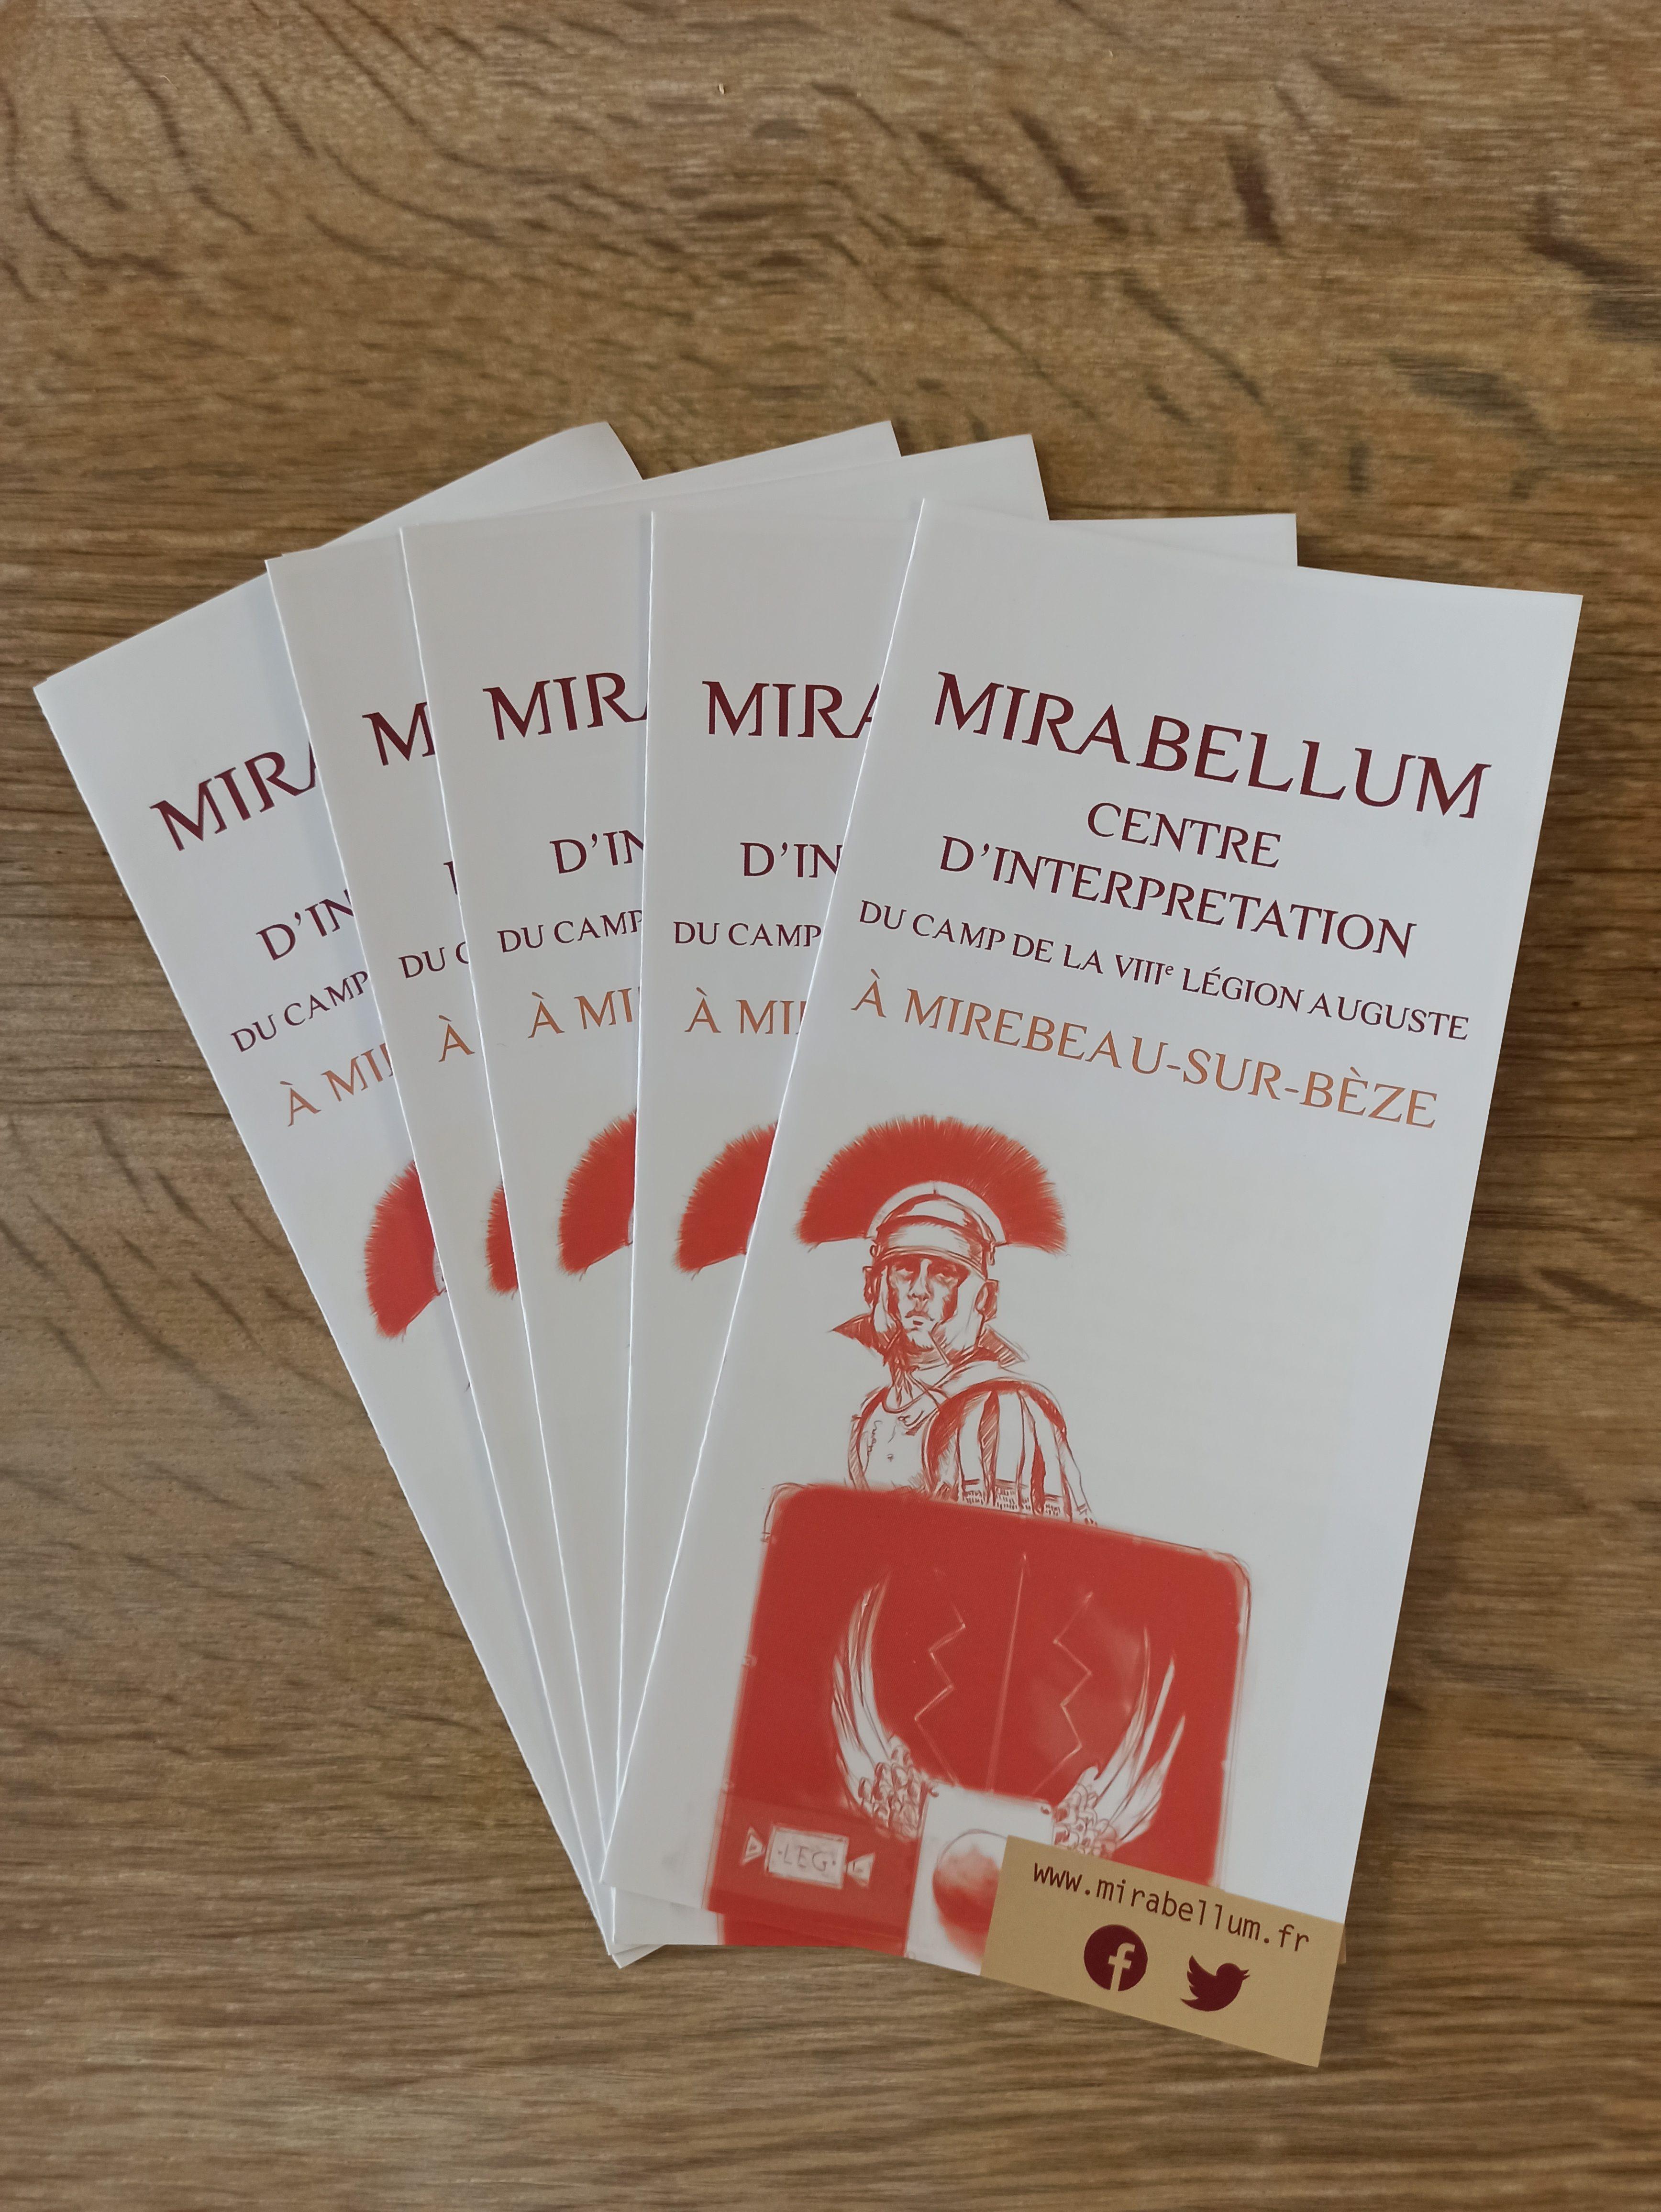 Nous avons notre flyer ! - Flyer du Mirabellum